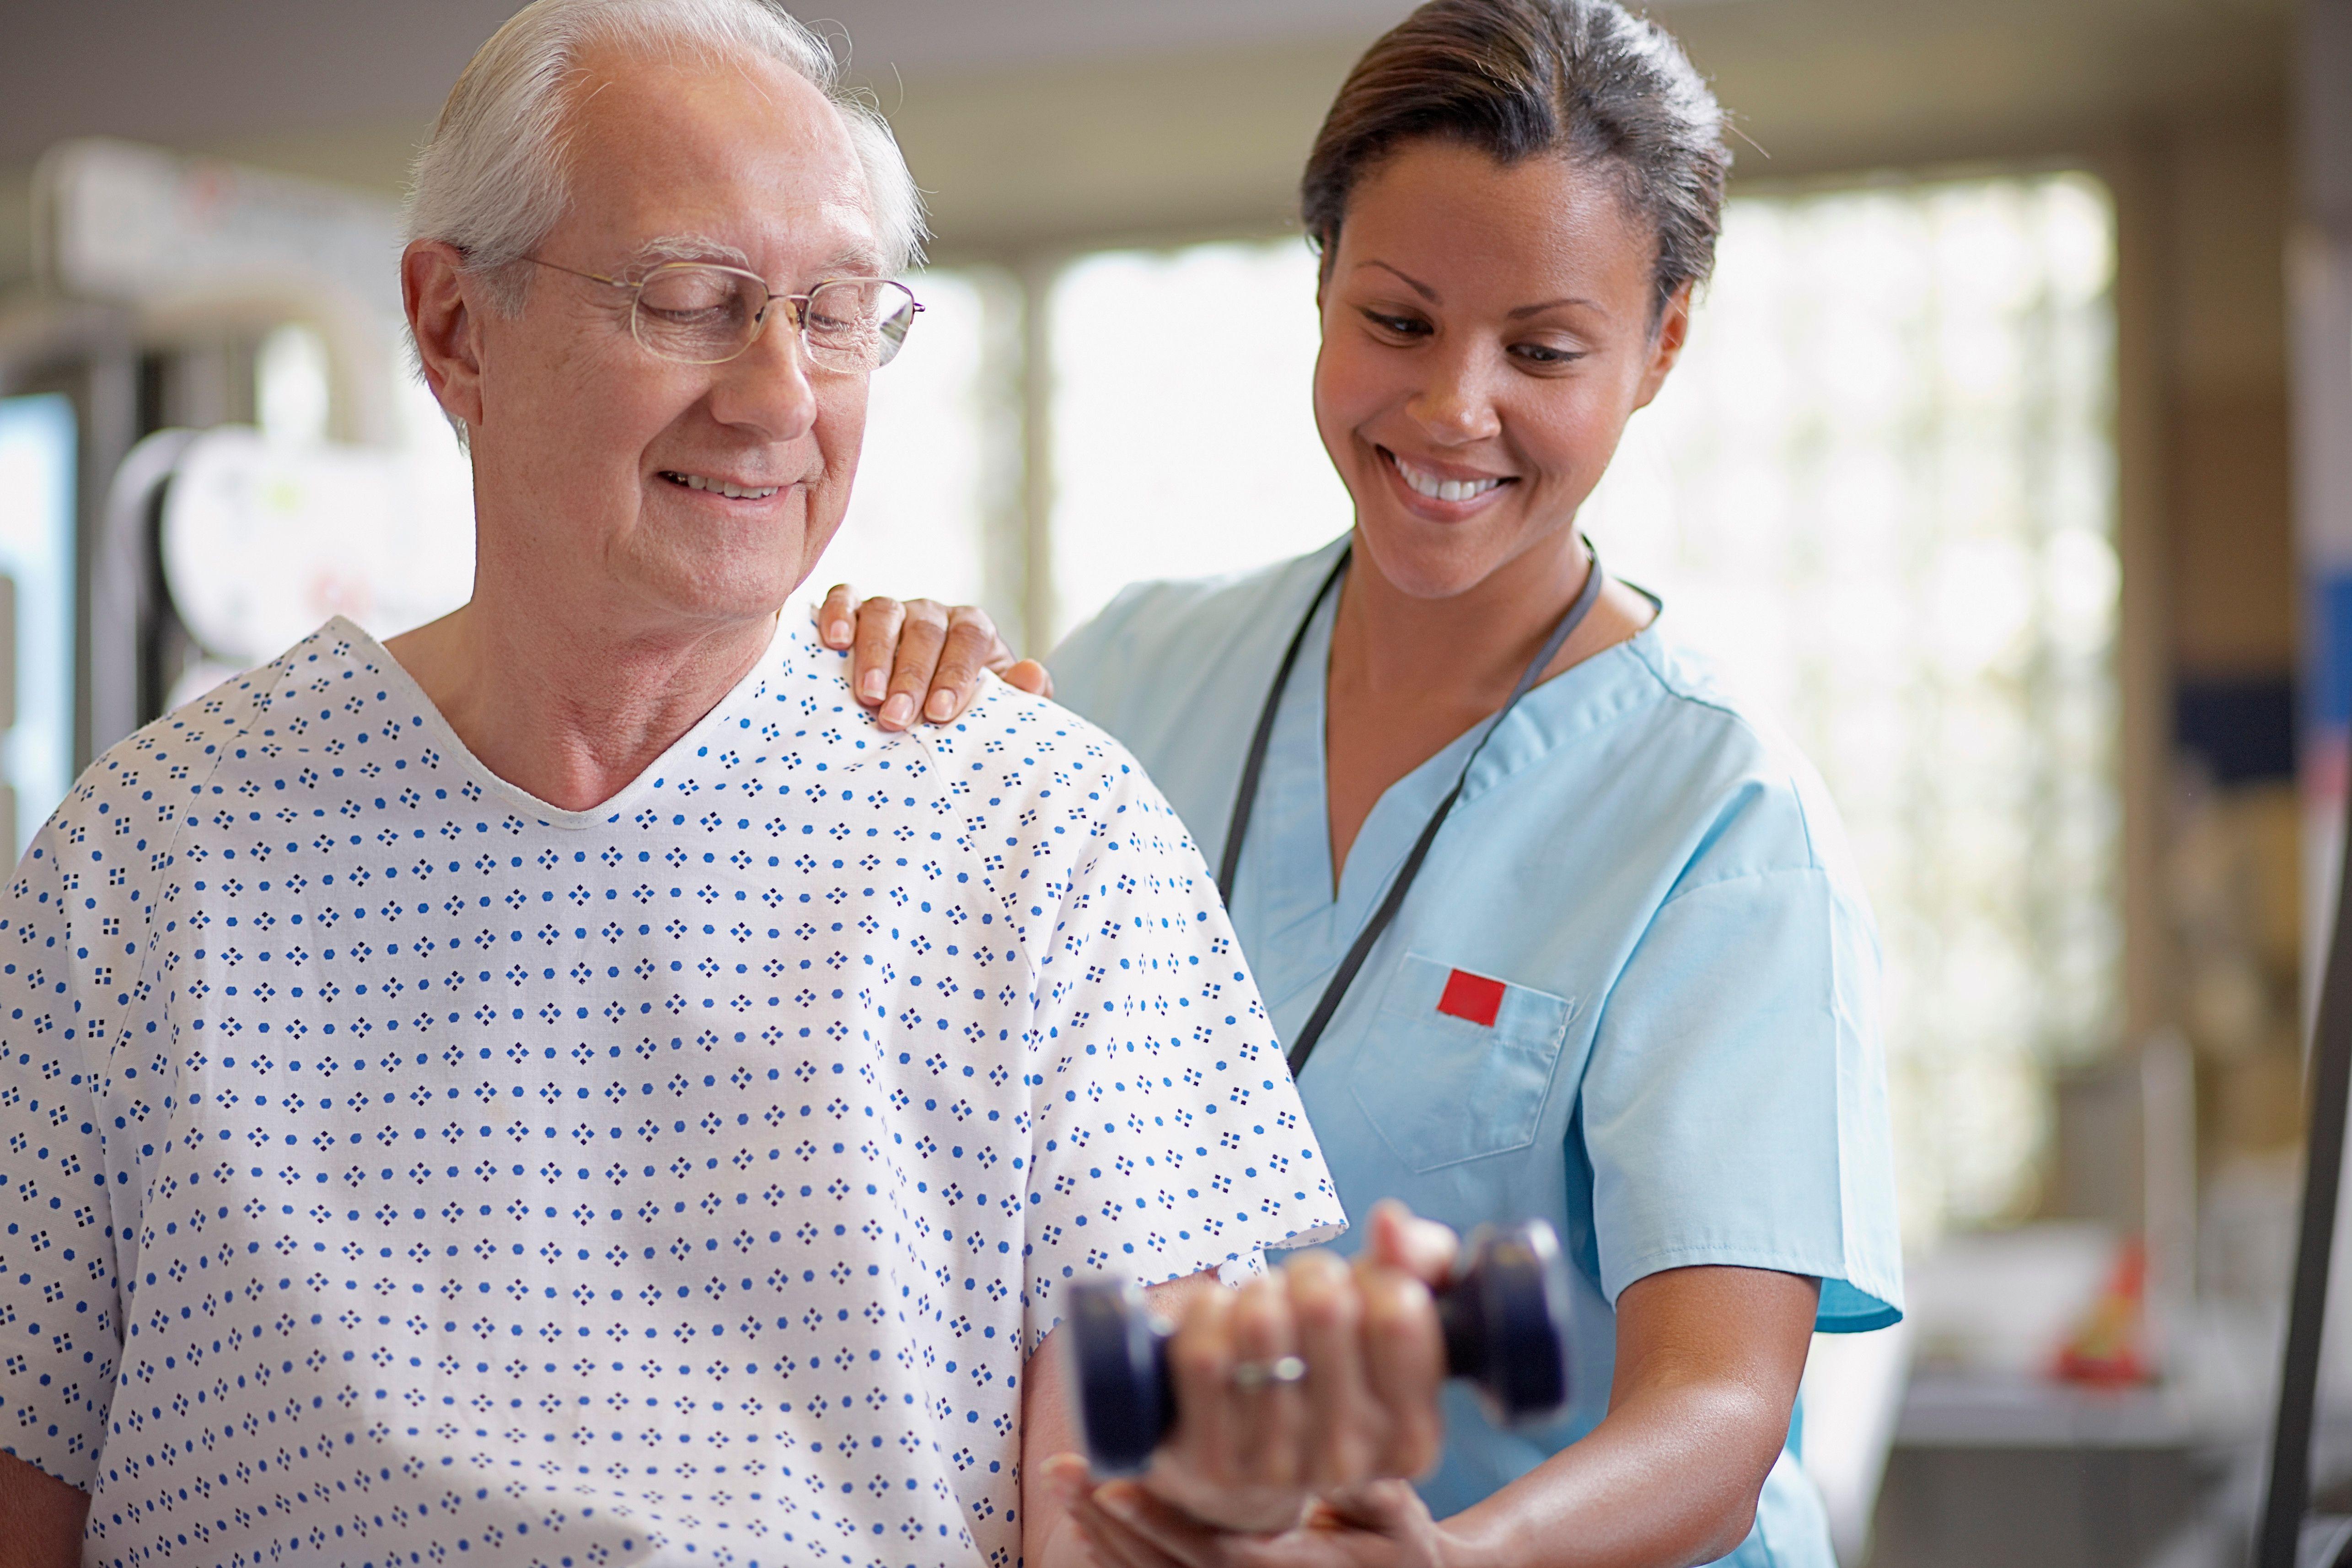 A female nurse works with an elderly man